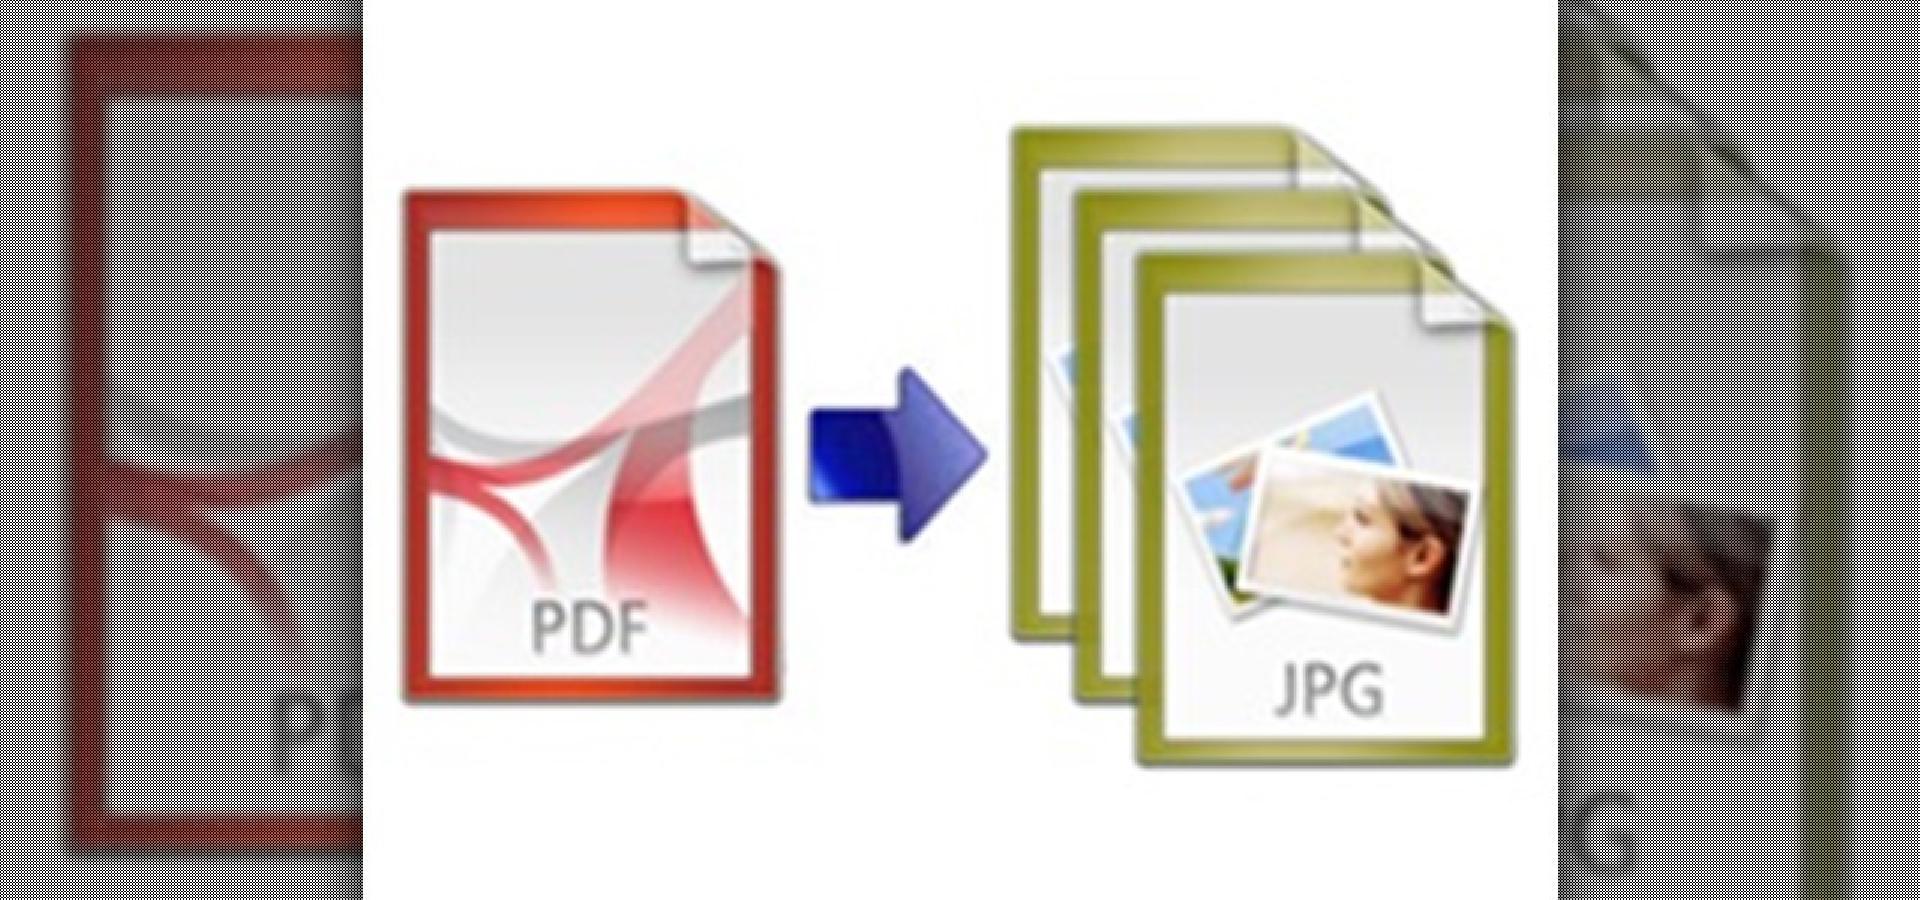 Document Converting